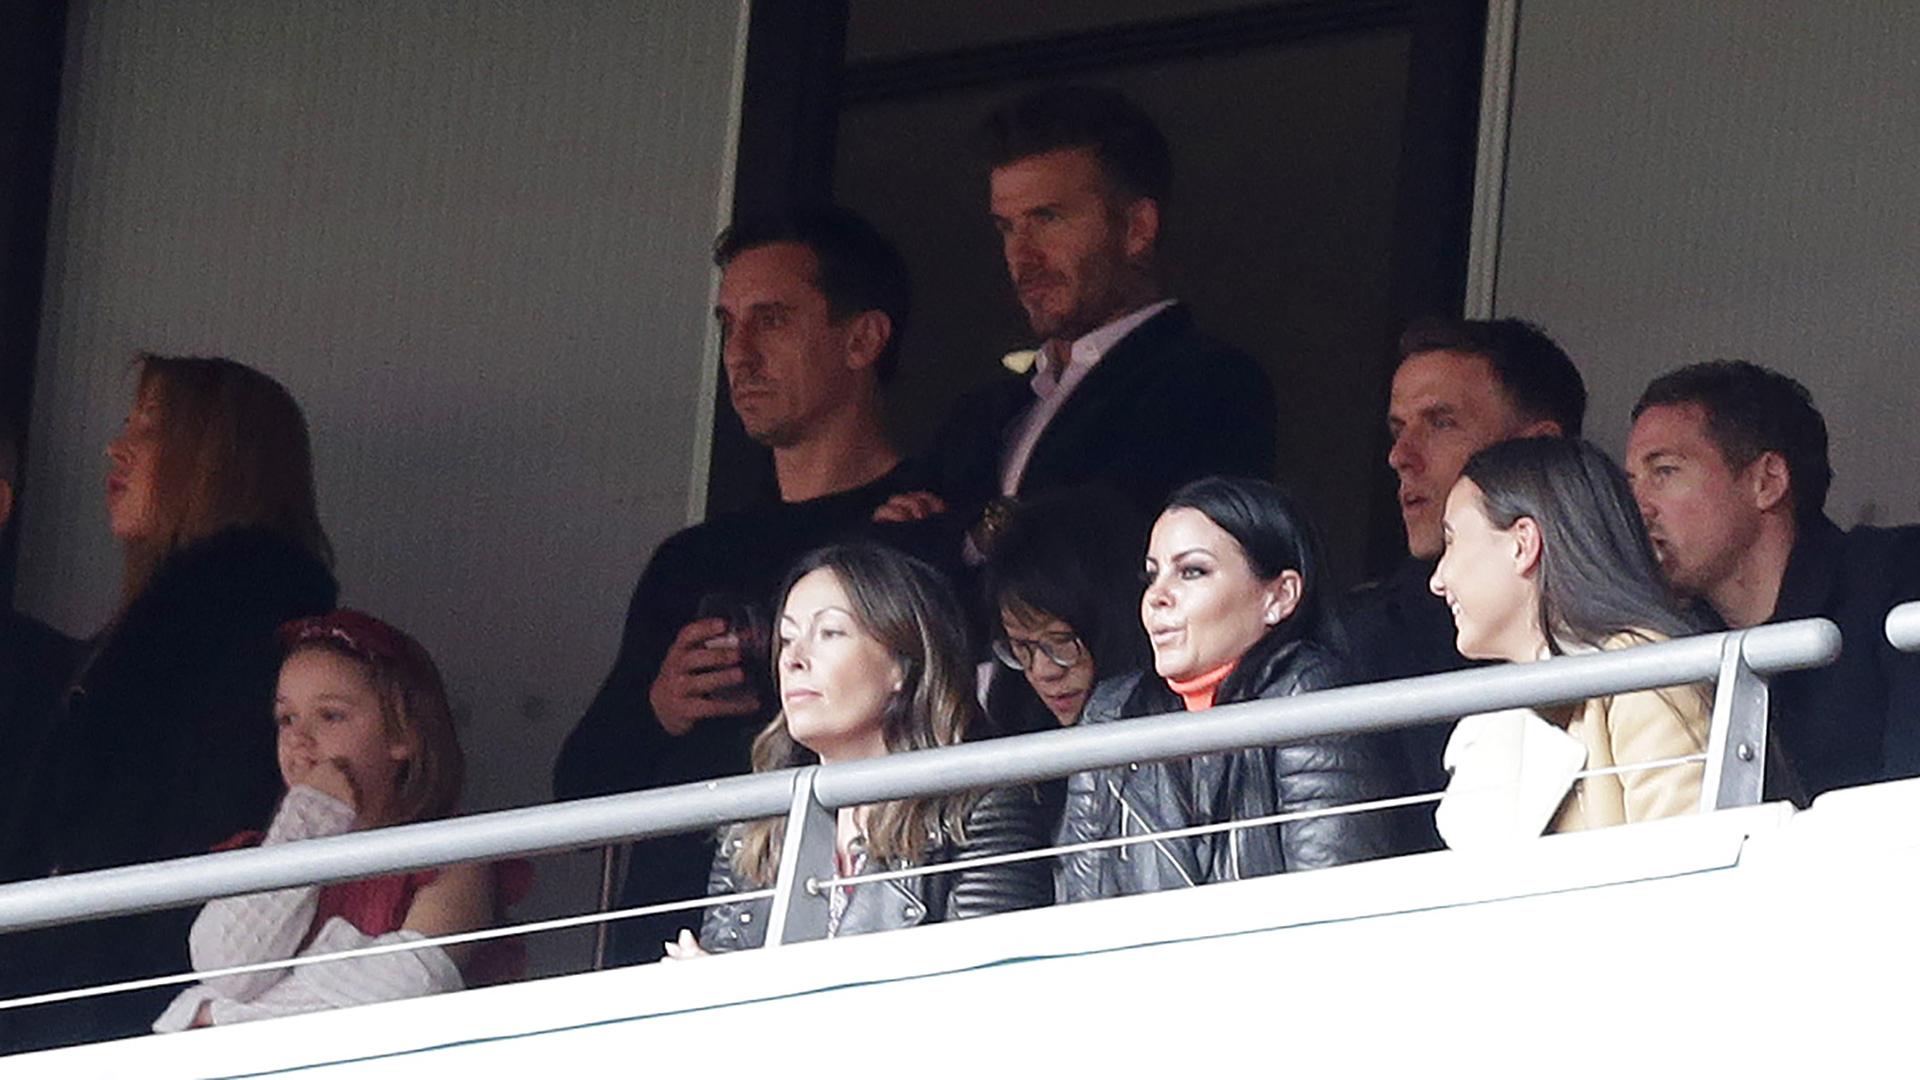 David Beckham Gary Neville Salford City 2019